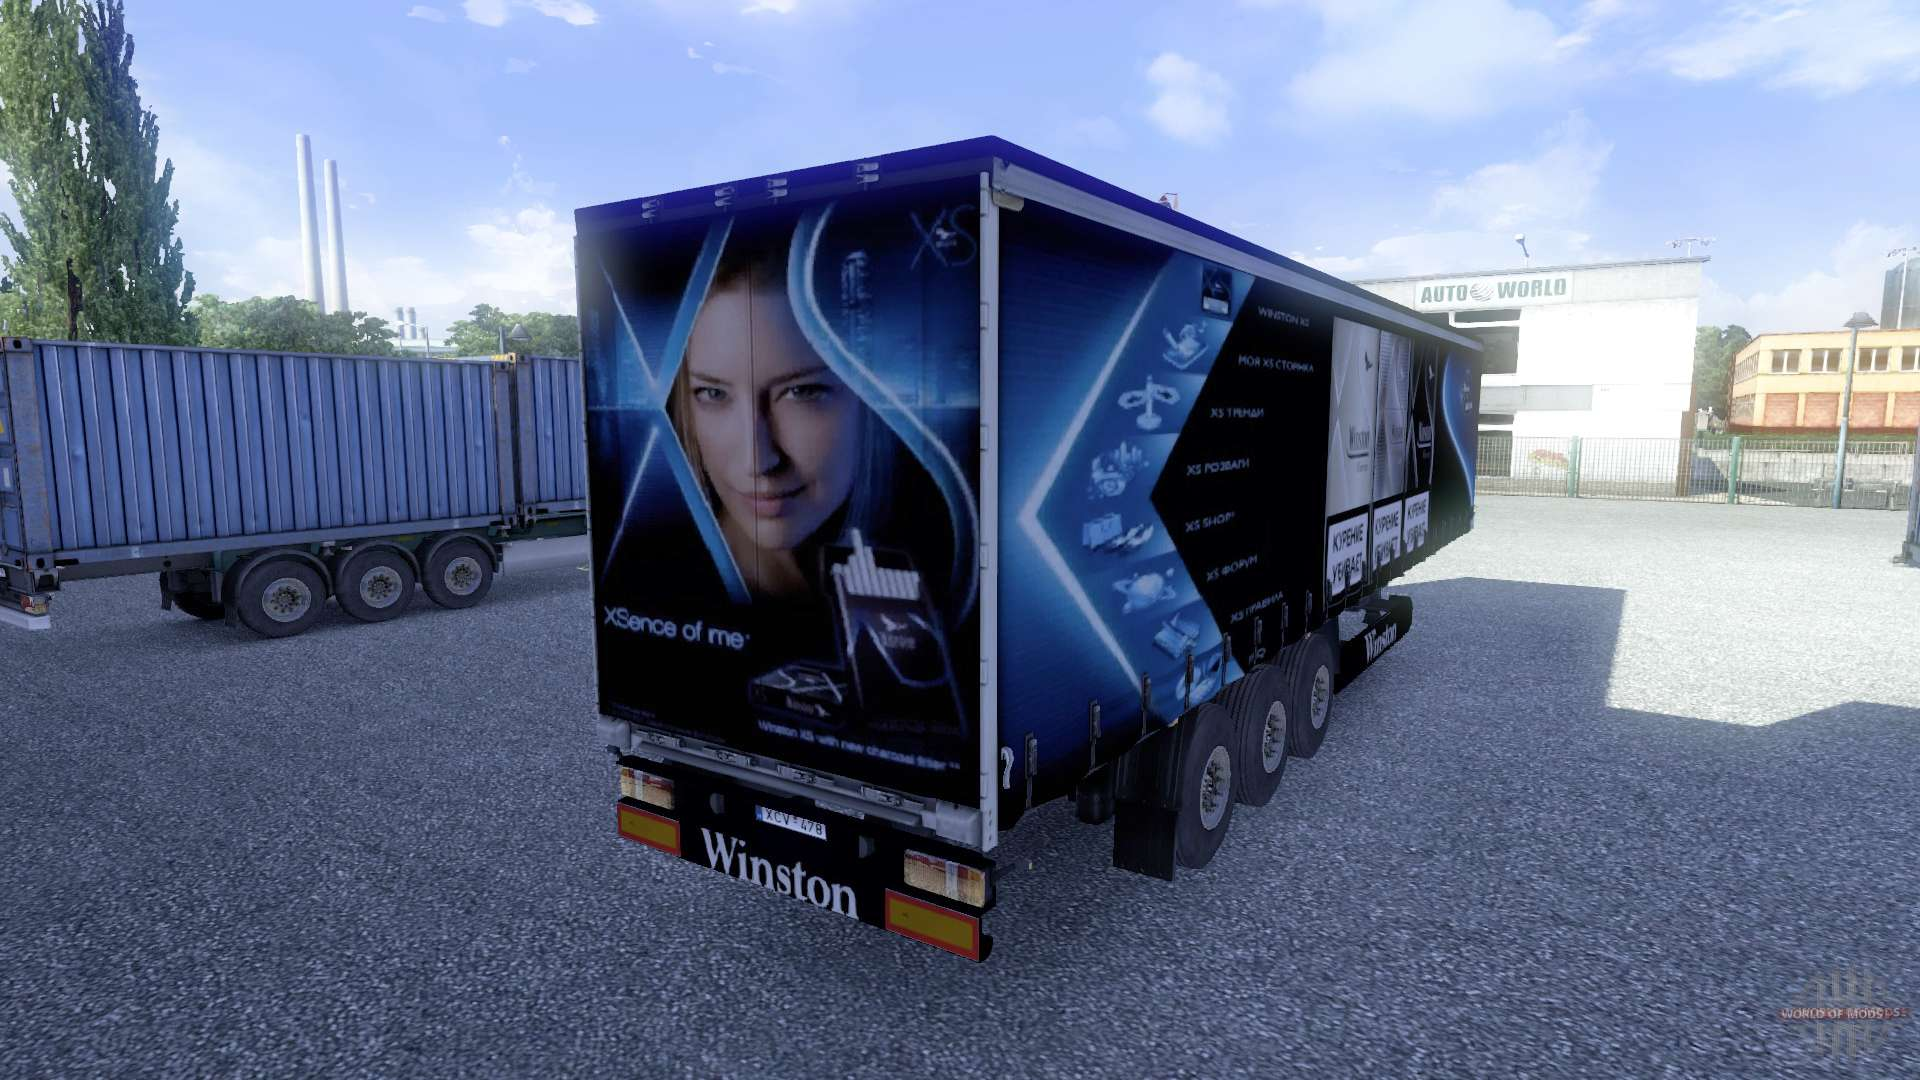 Euro Truck Simulator 2 trailers - download ETS 2 trailer mods